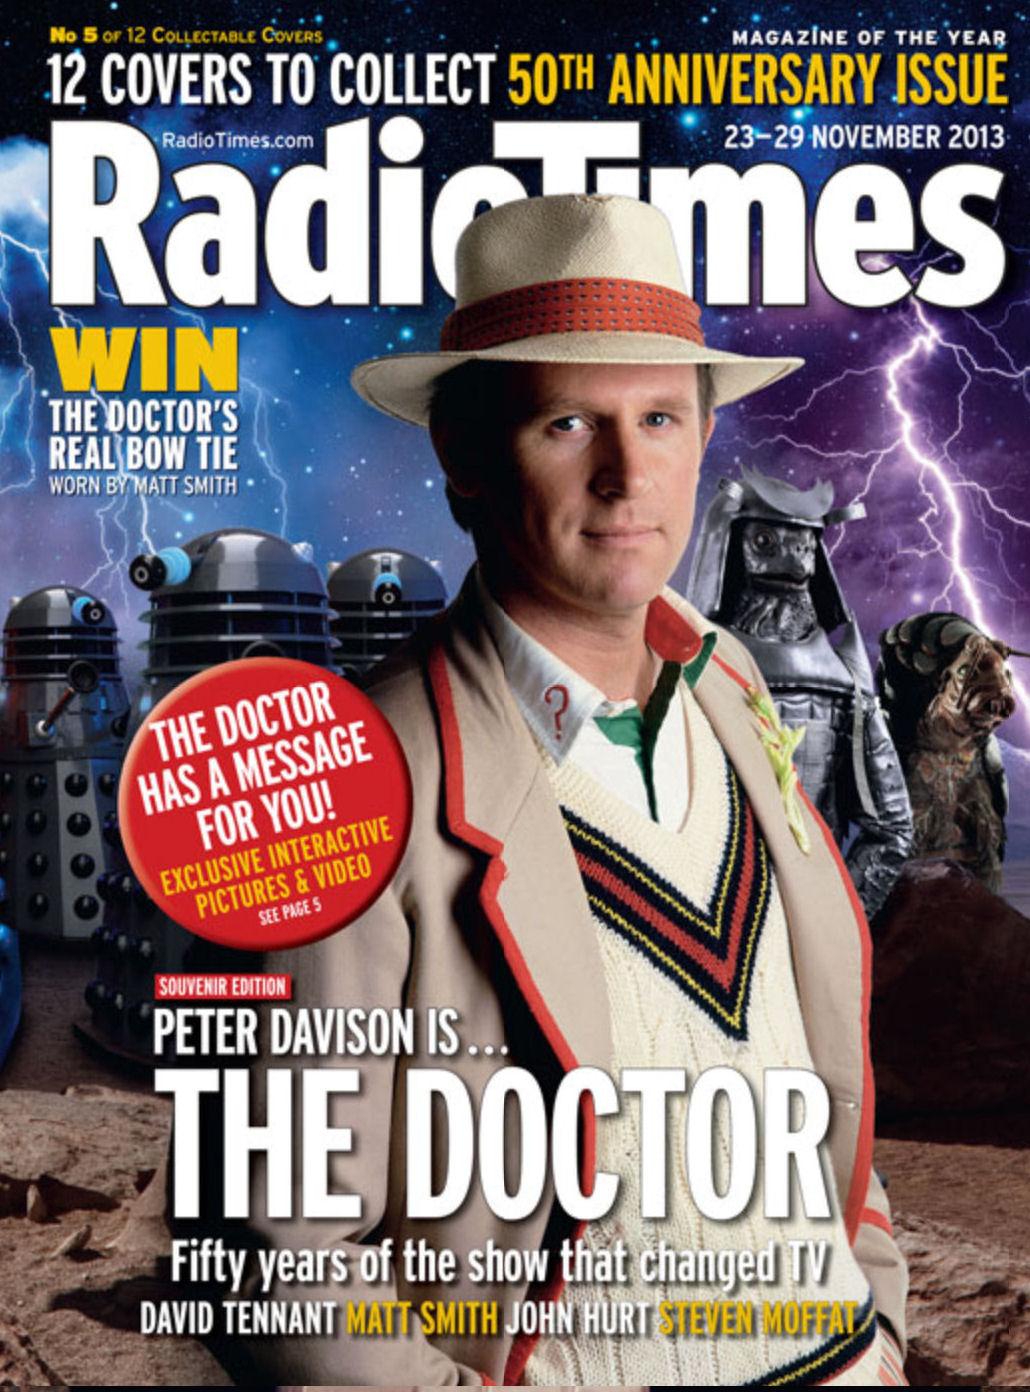 Radio times 50th anniversary covers planet mondasplanet for Anniversary magazine